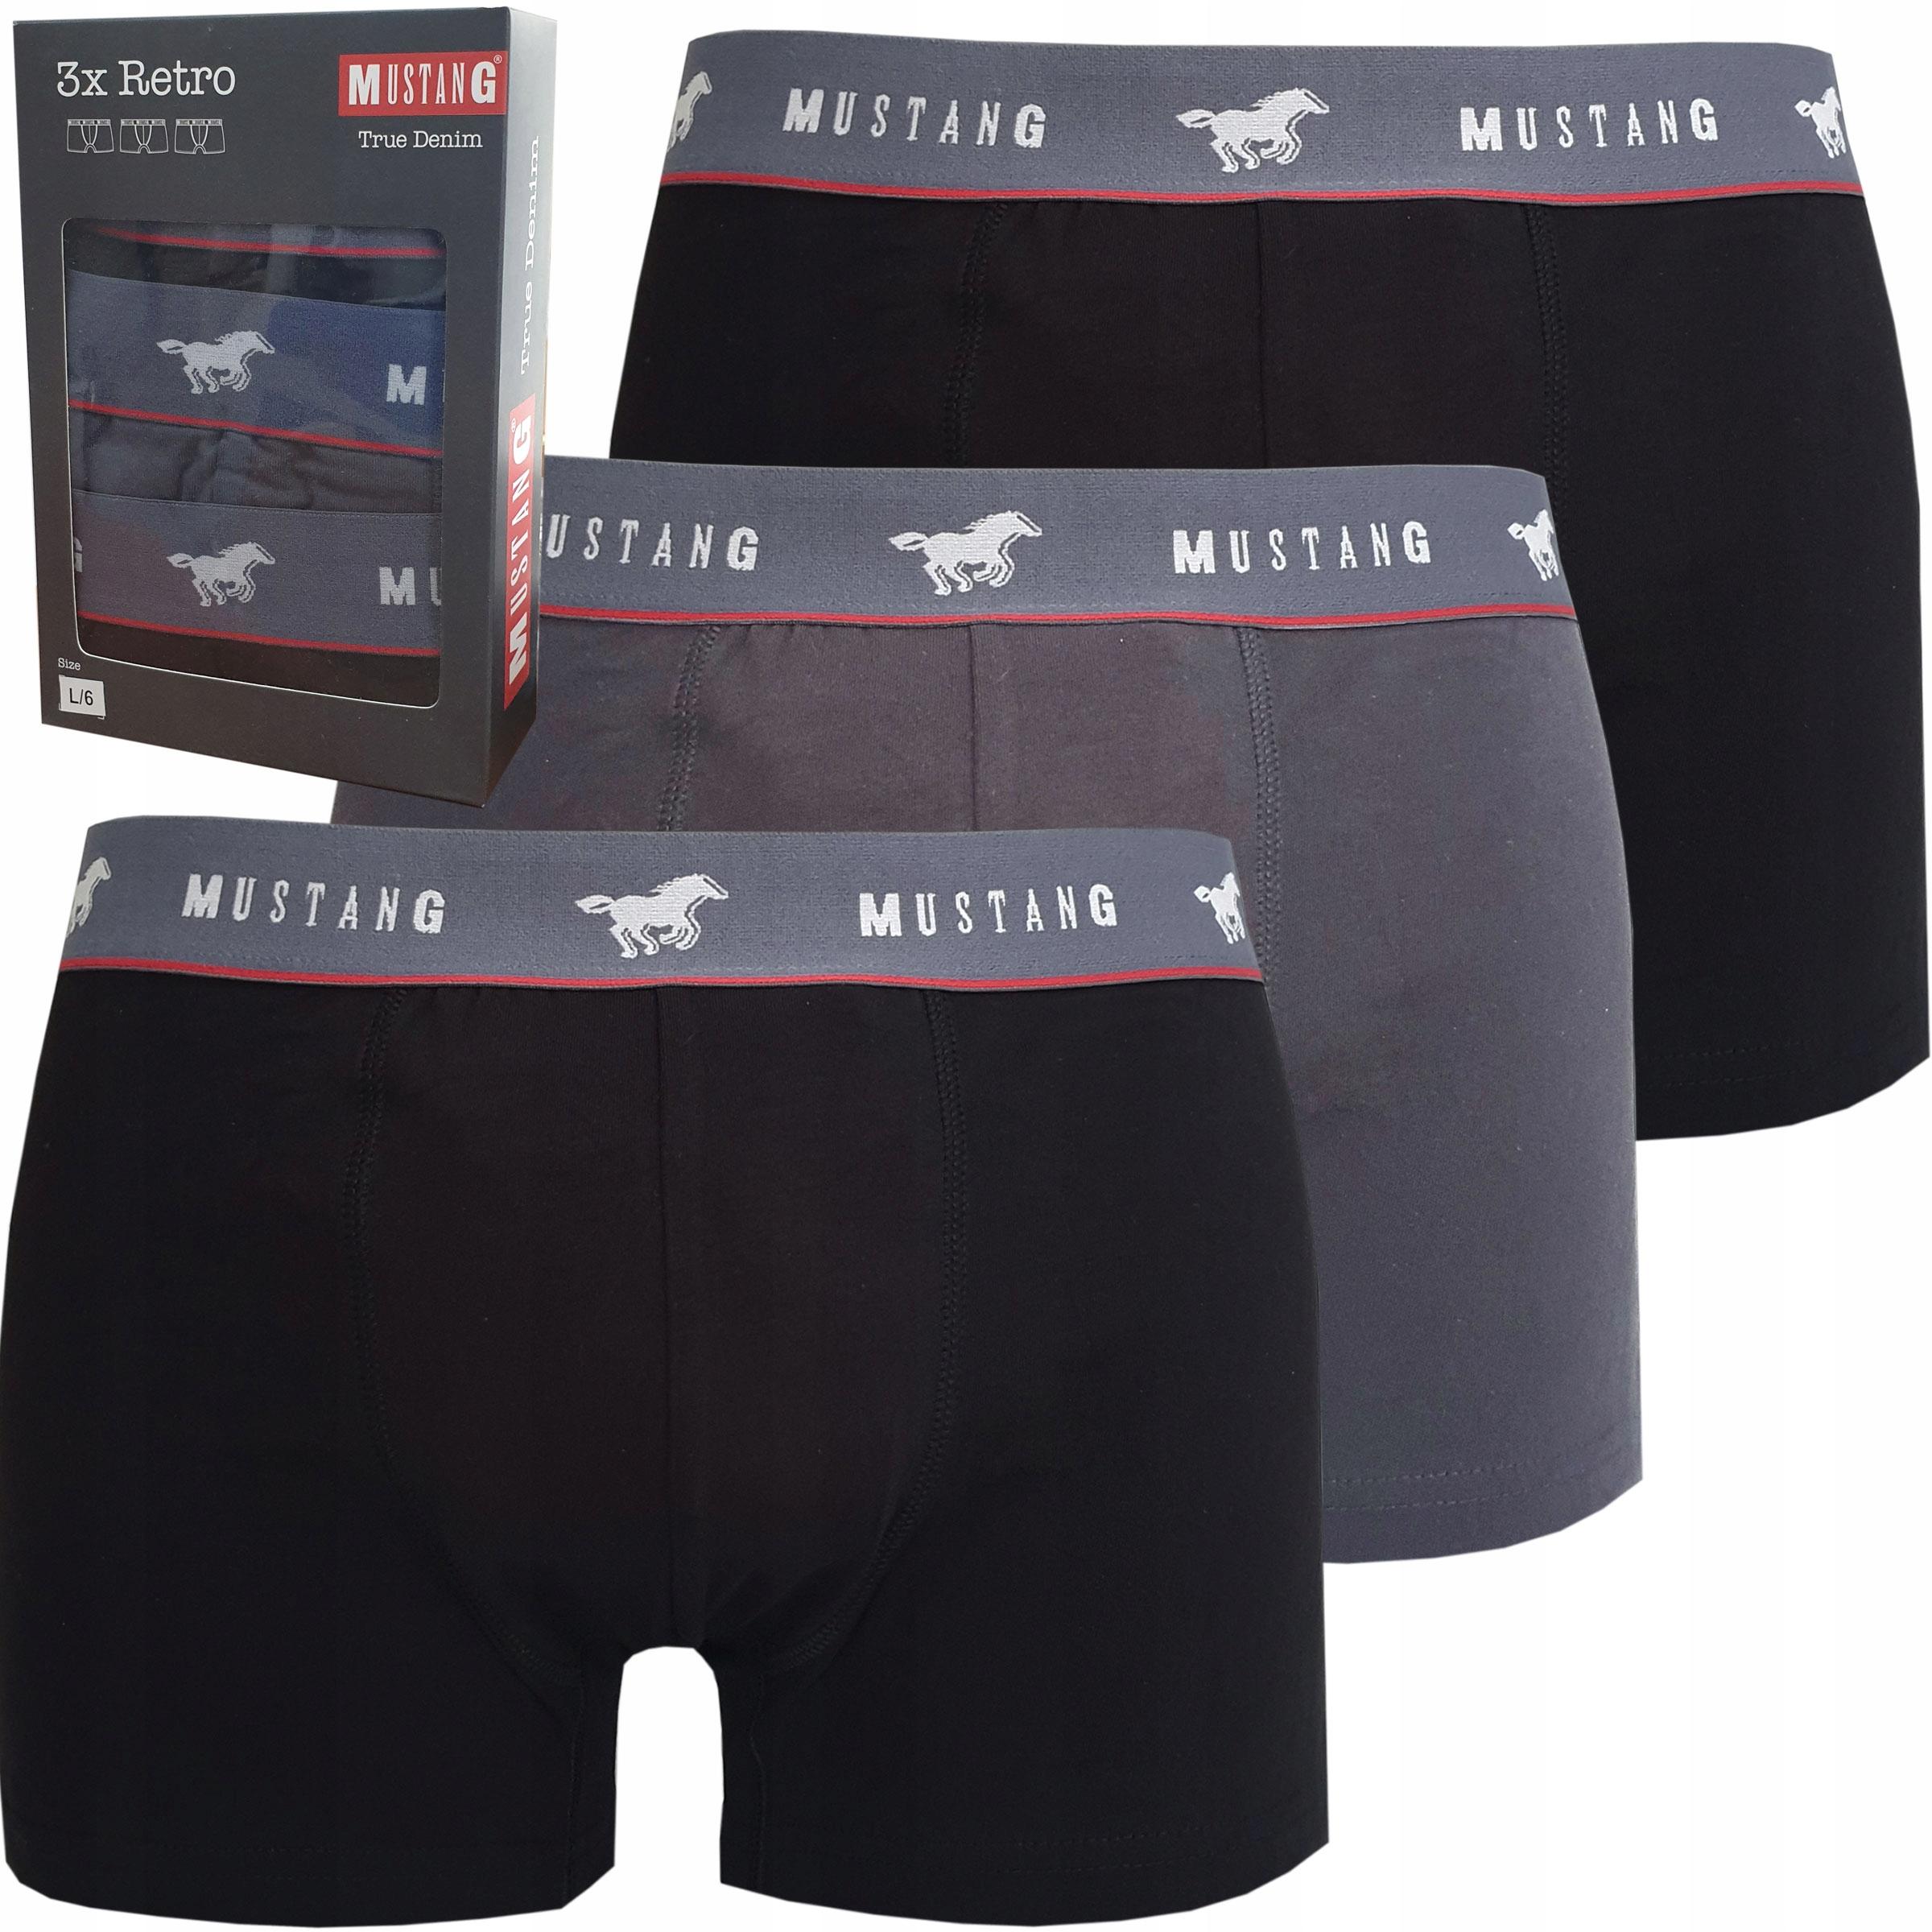 Mustang True Denim 3-pack boxerky RETRO MUS. Ľ